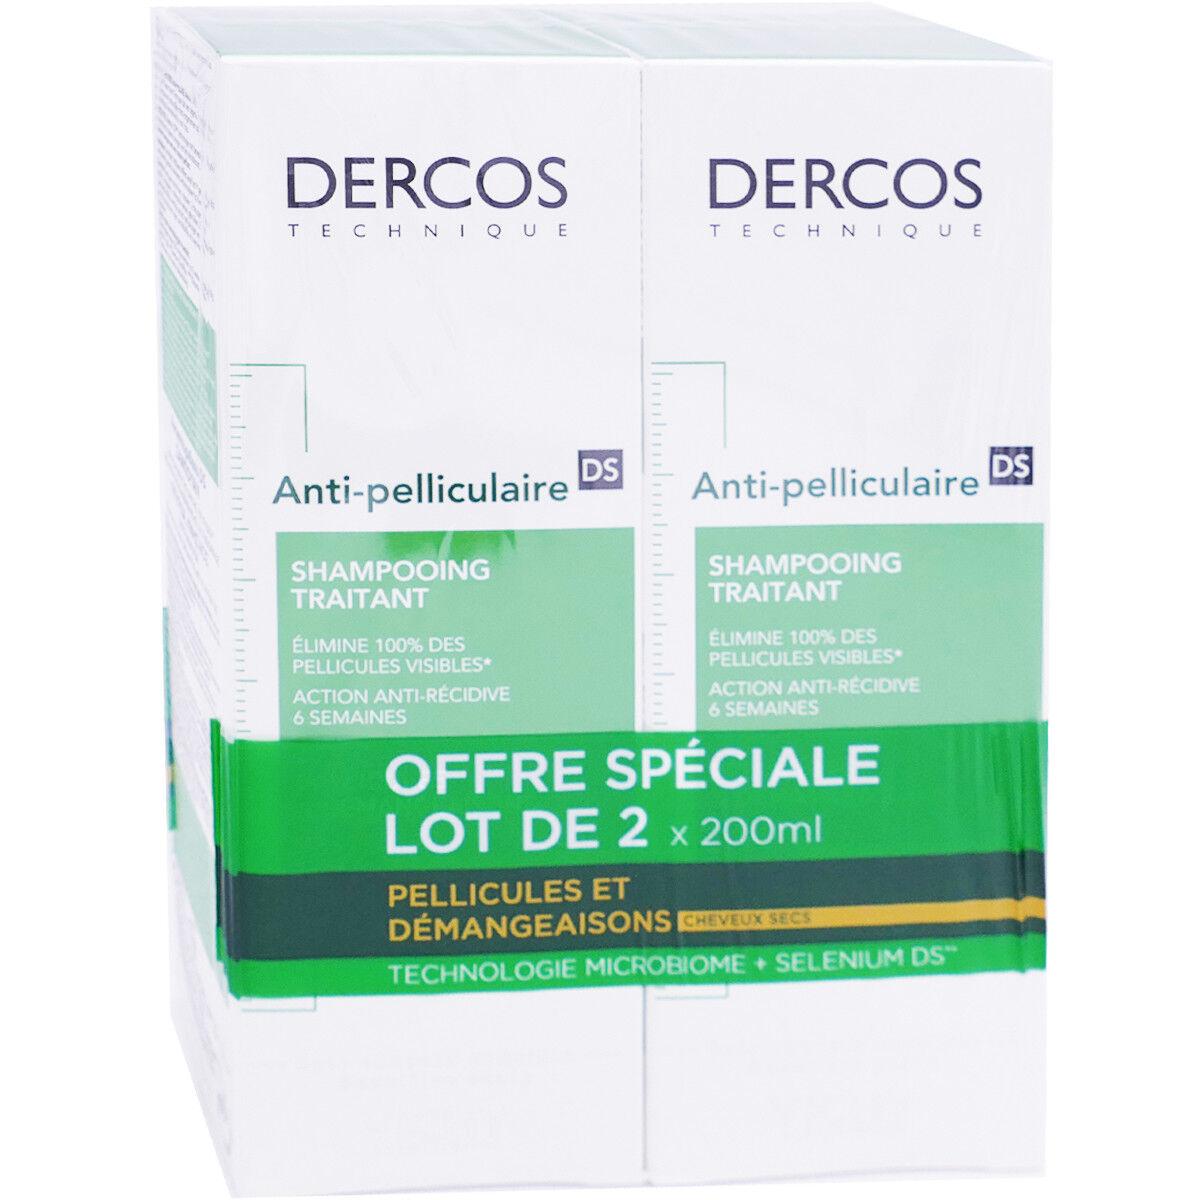 VICHY Dercos shampooing aniti-pelliculaire 2x200ml cheveux secs